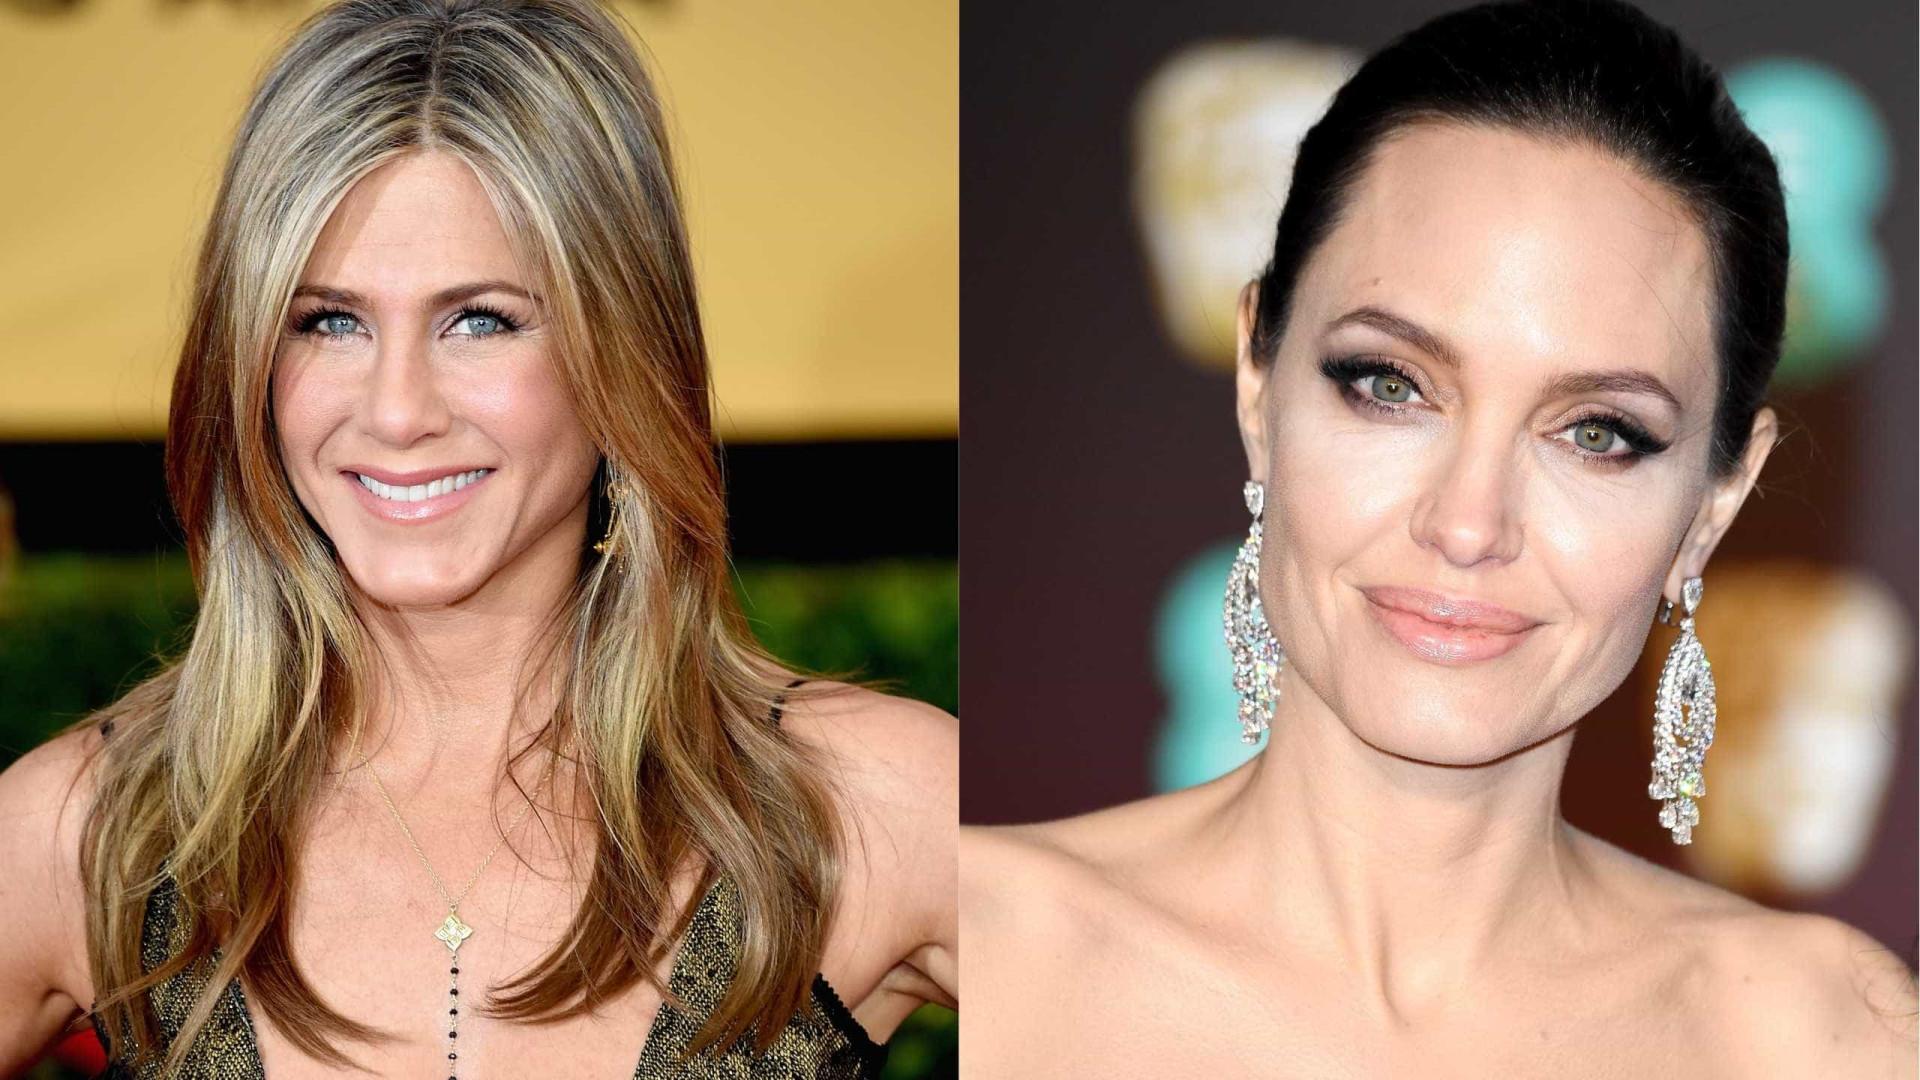 Jennifer Aniston perdeu bebê do ex Justin Theroux, diz revista